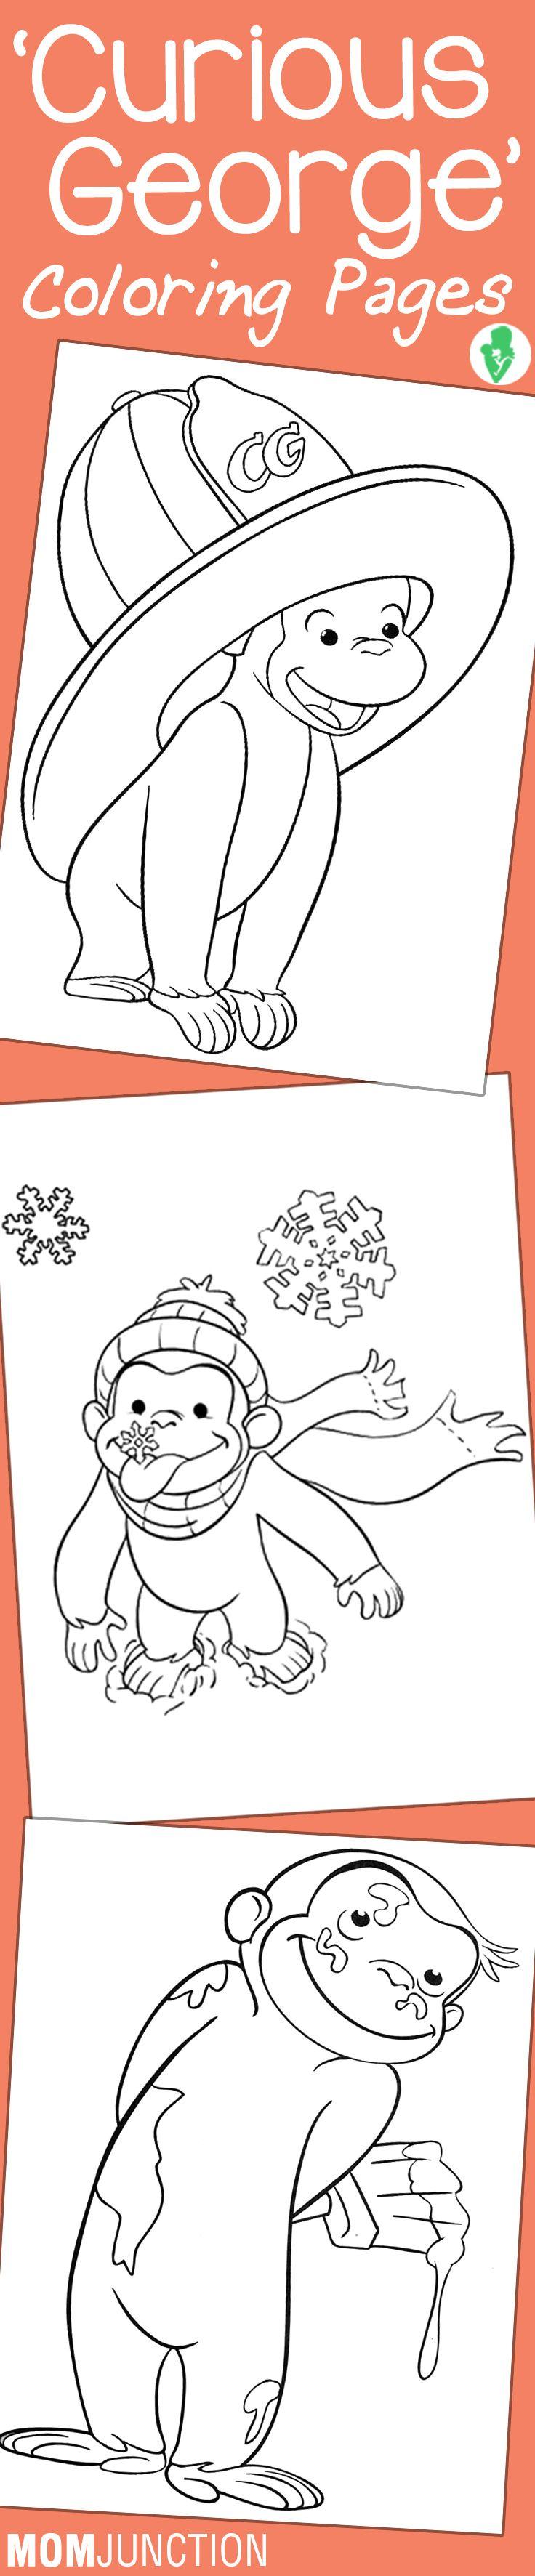 Krafty kidz center curious george coloring pages - Krafty Kidz Center Curious George Coloring Pages 15 Best Curious George Coloring Pages For Your Download